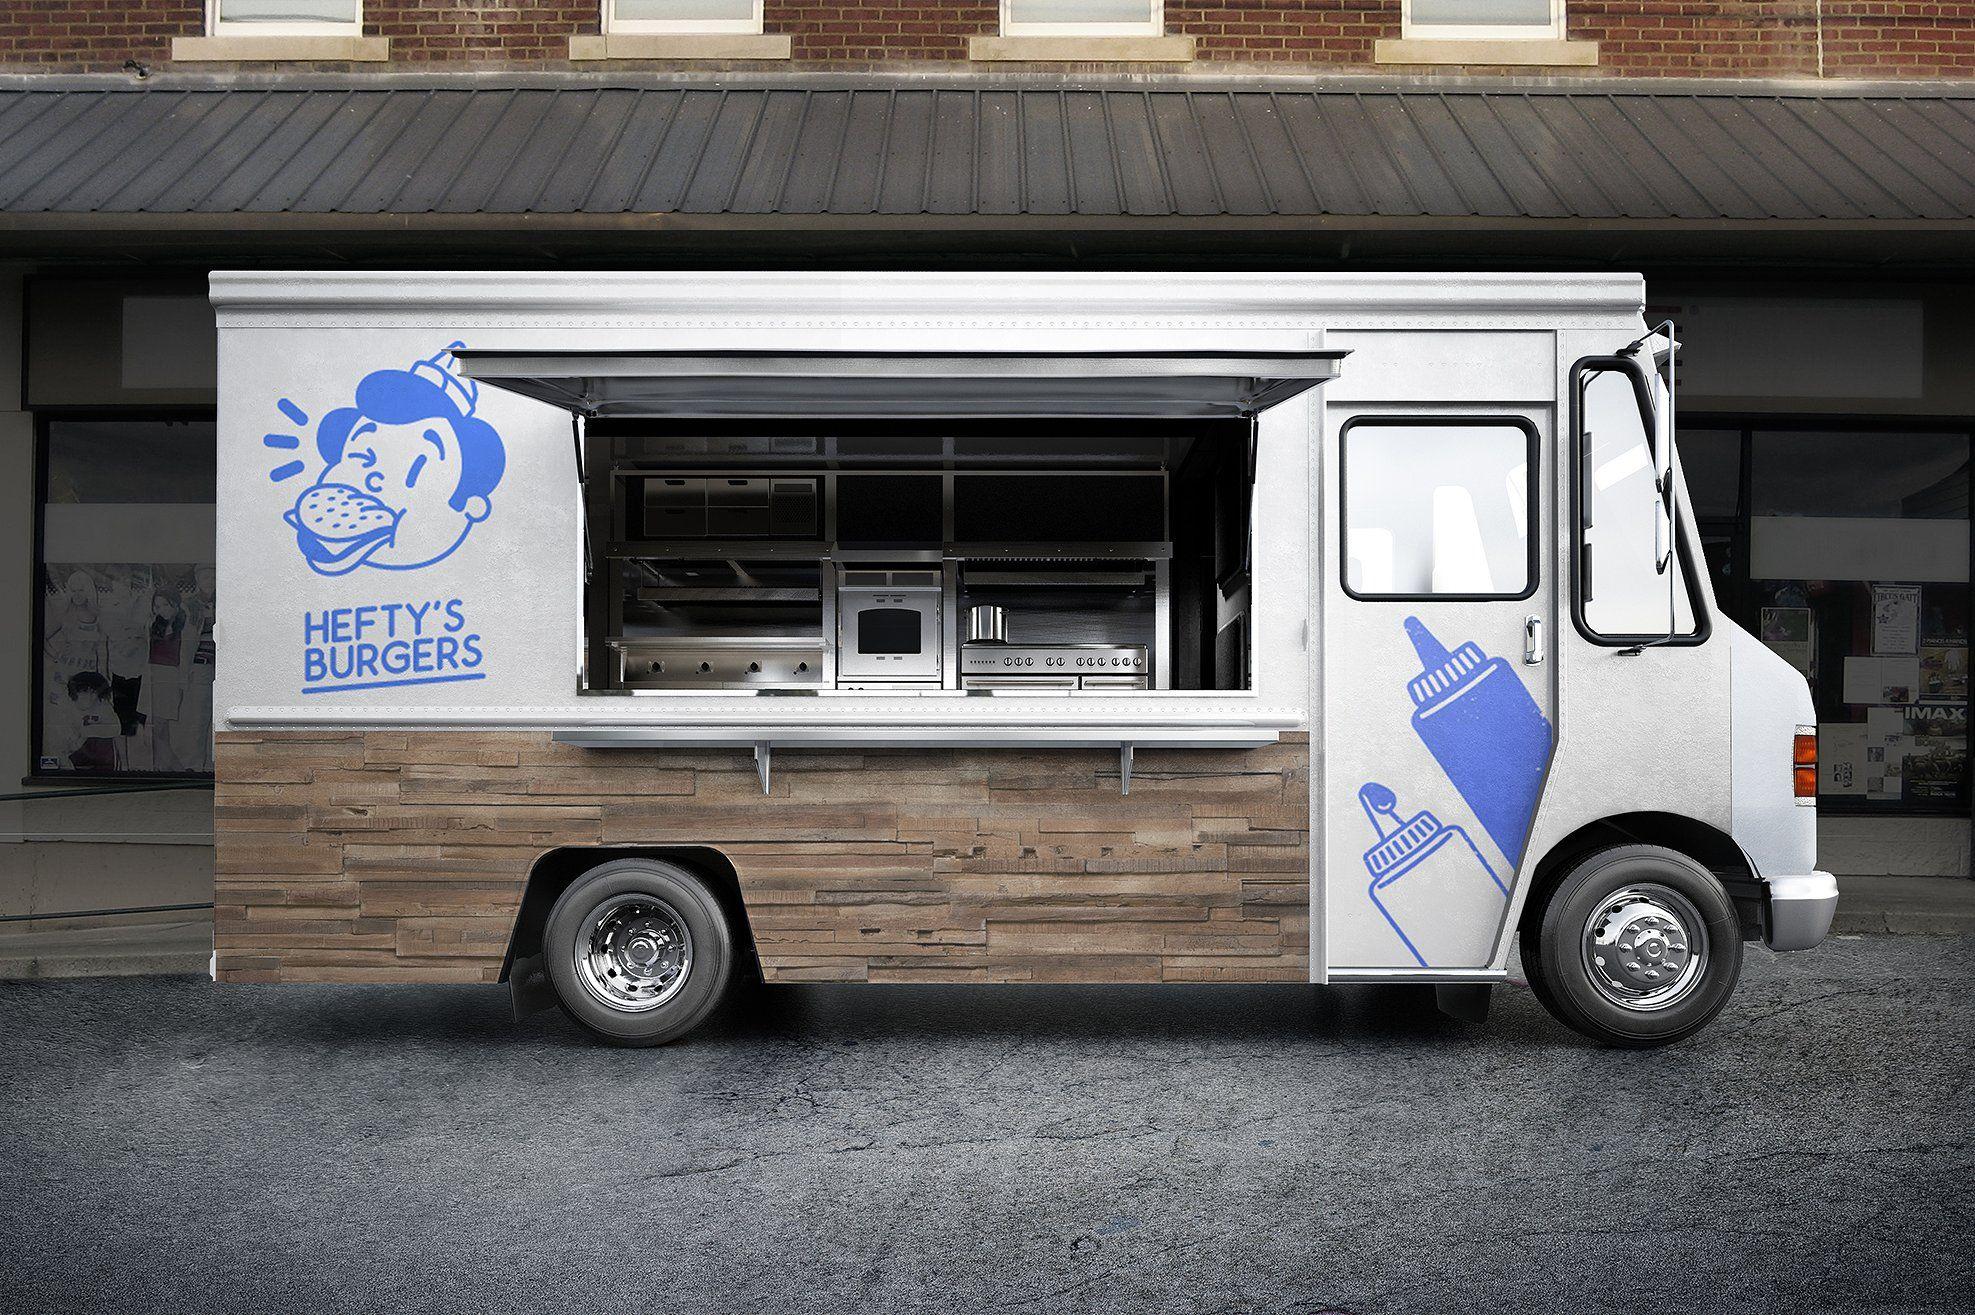 Food Truck Psd Mockup Food Truck Food Truck Design Fine Dining Recipes